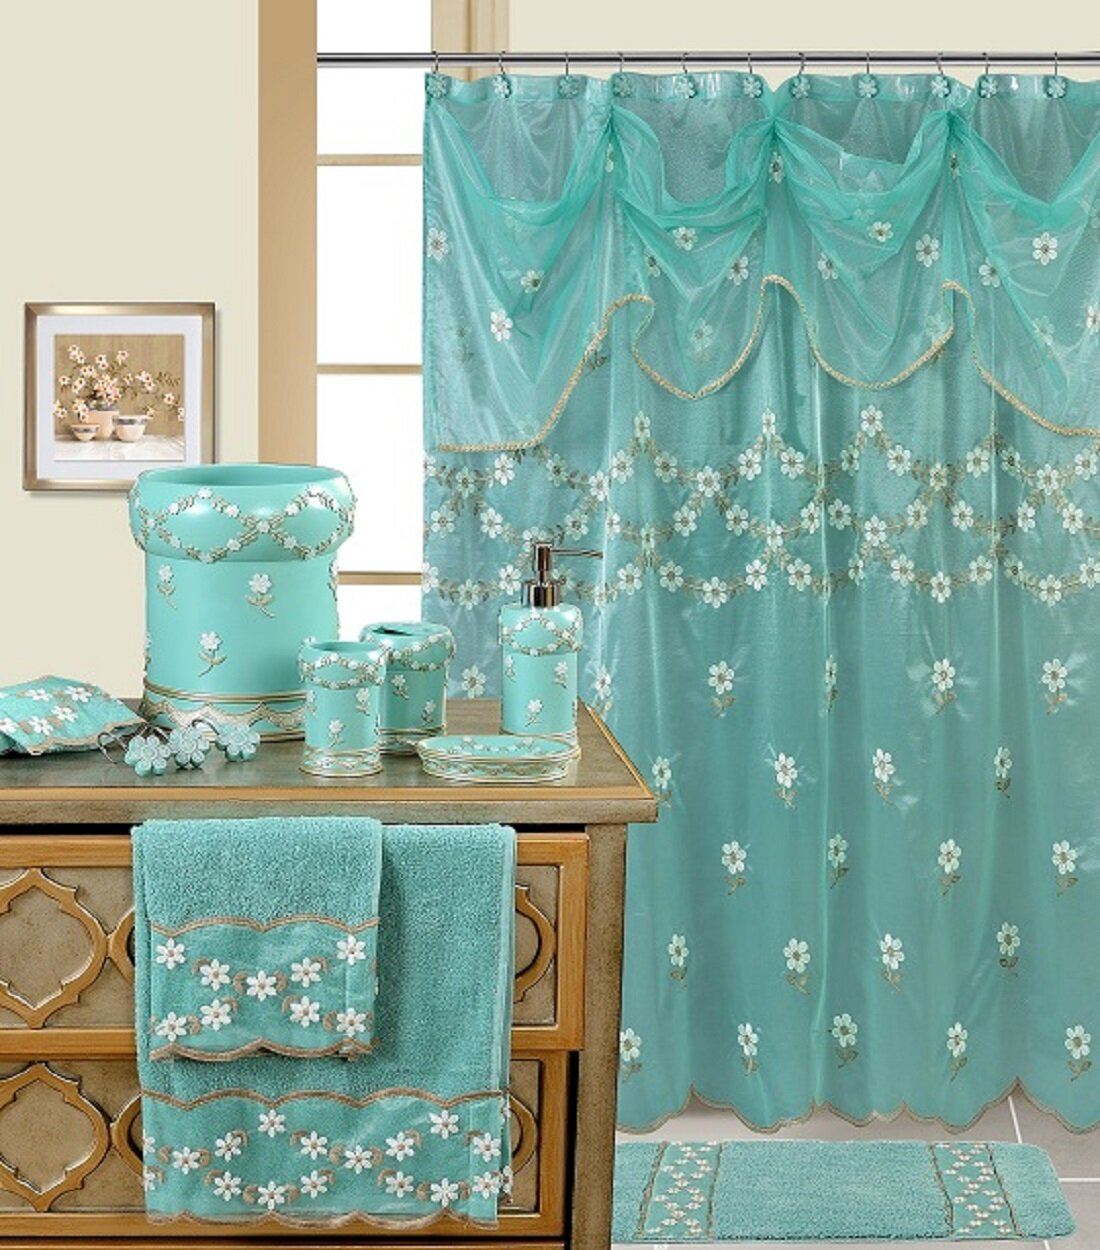 Daniels Bath Decorative Shower Curtain & Reviews   Wayfair